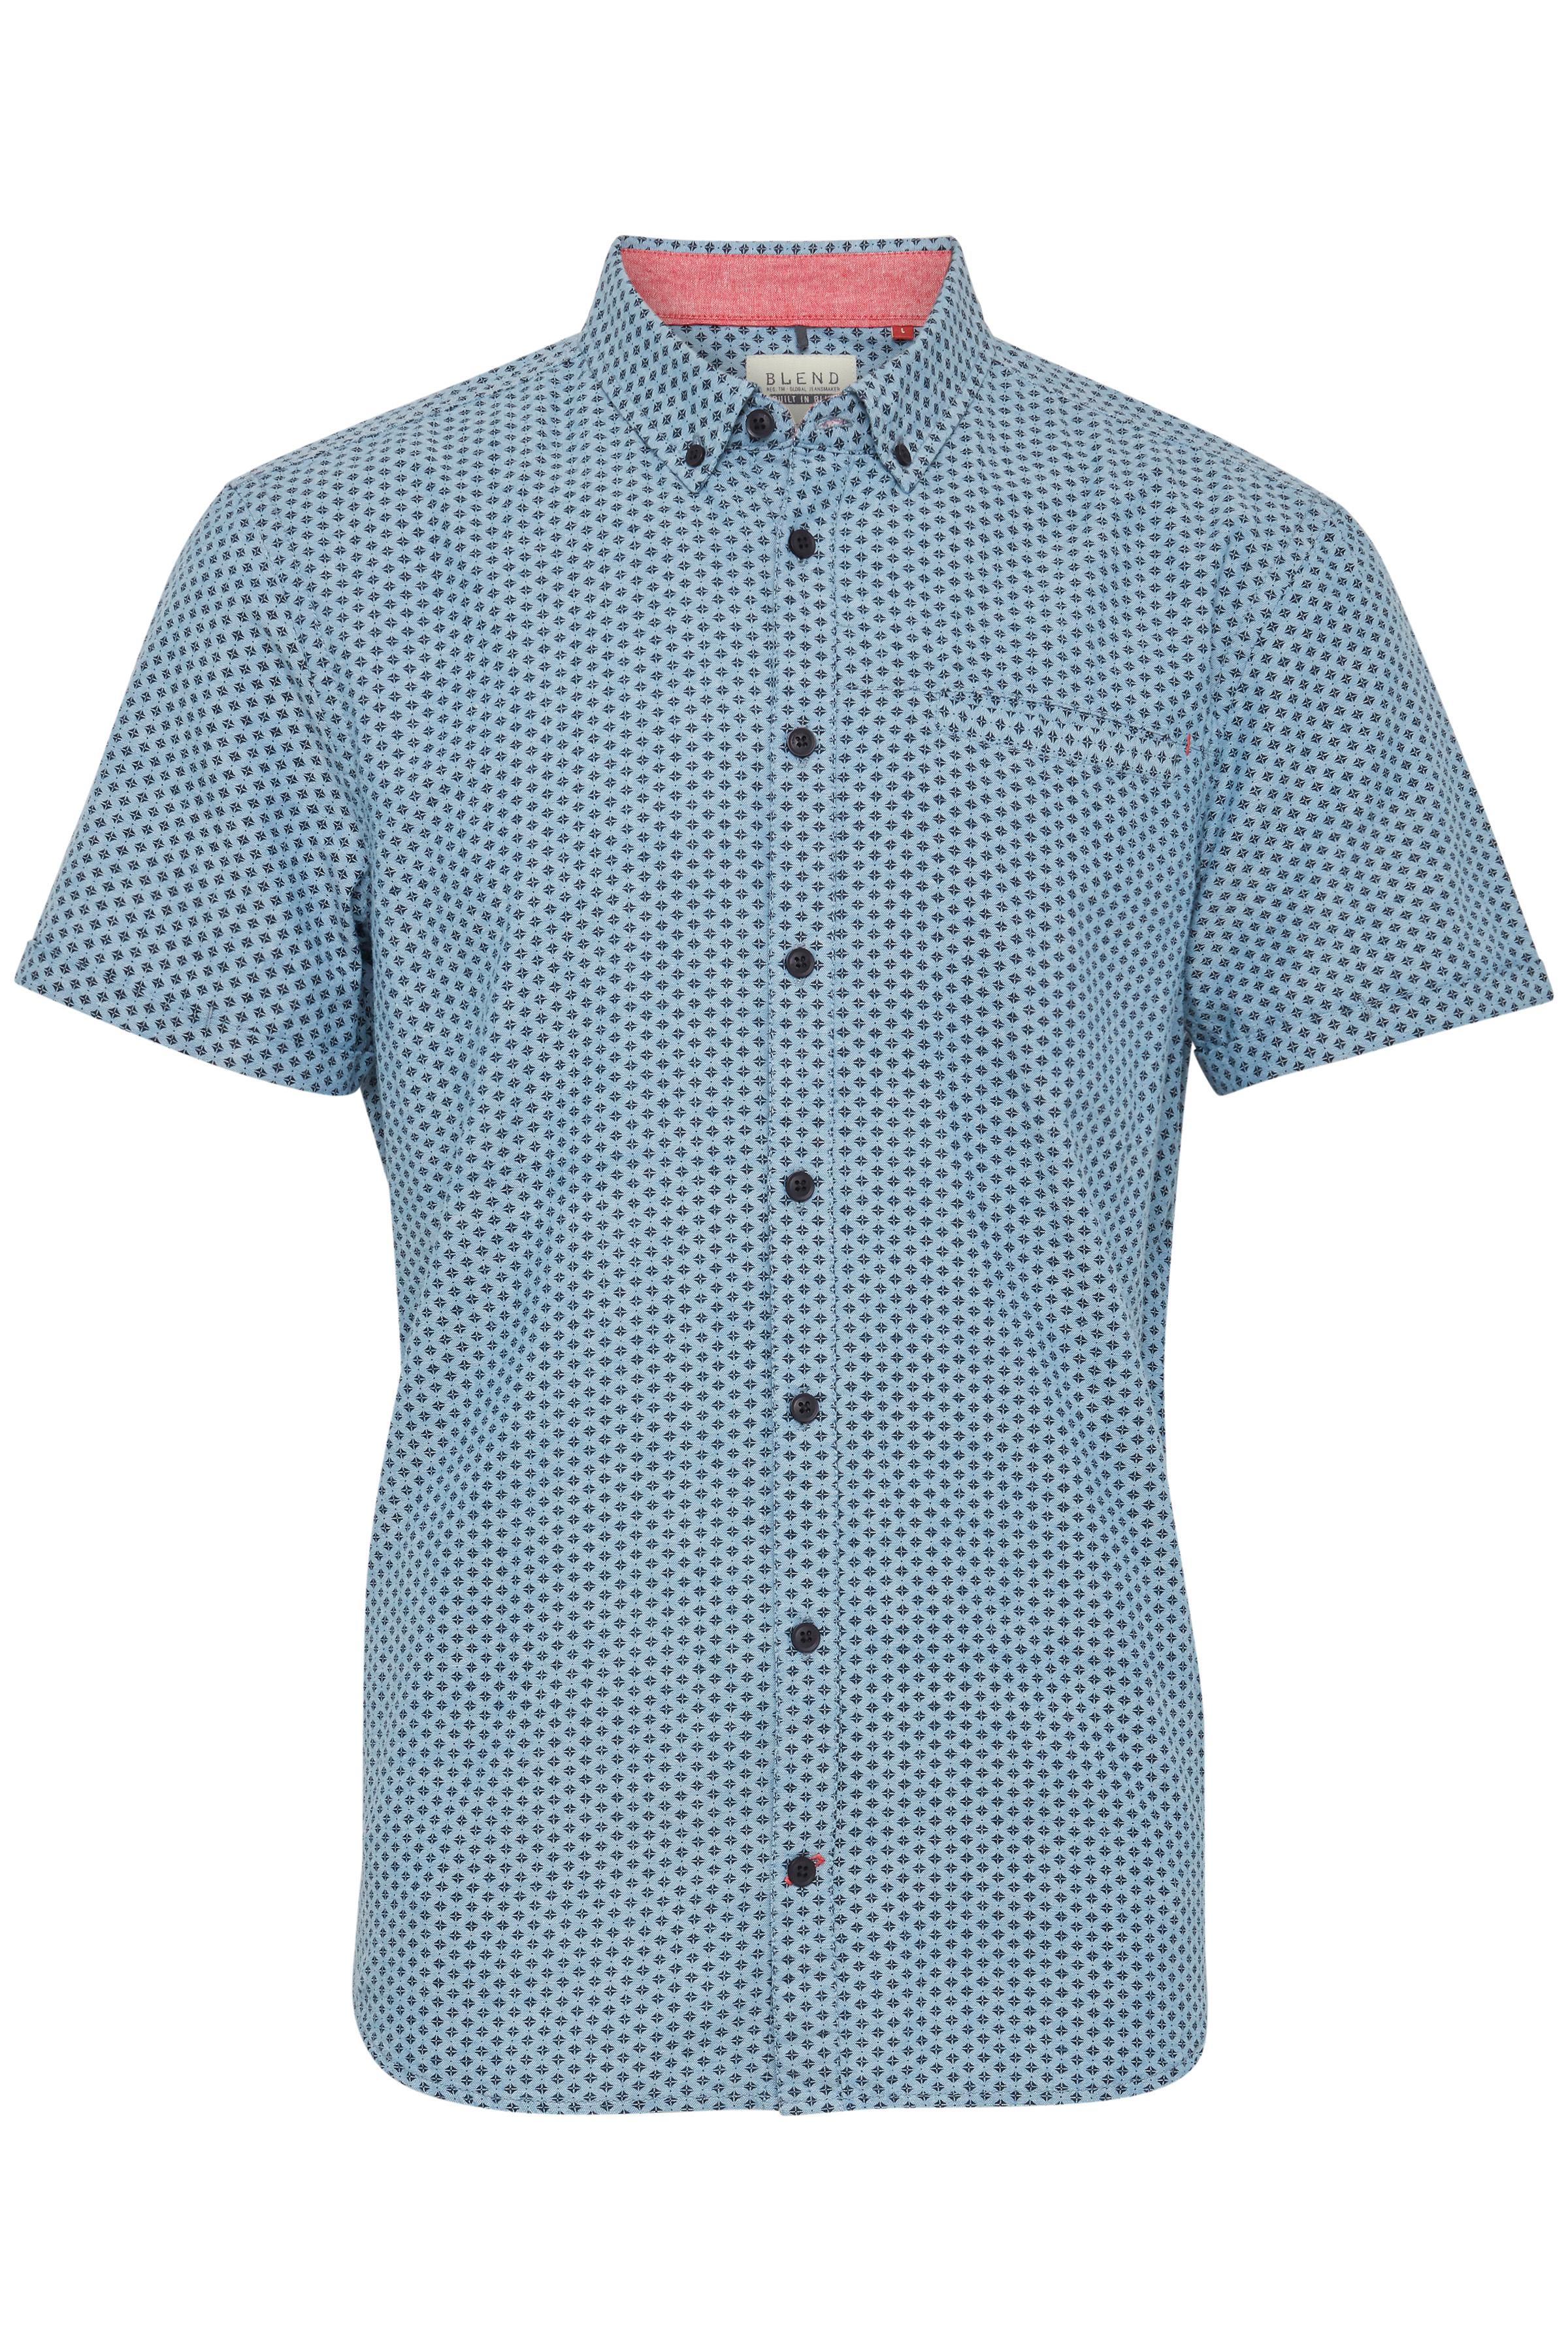 Niagara Blue Kortærmet skjorte fra Blend He – Køb Niagara Blue Kortærmet skjorte fra str. S-3XL her